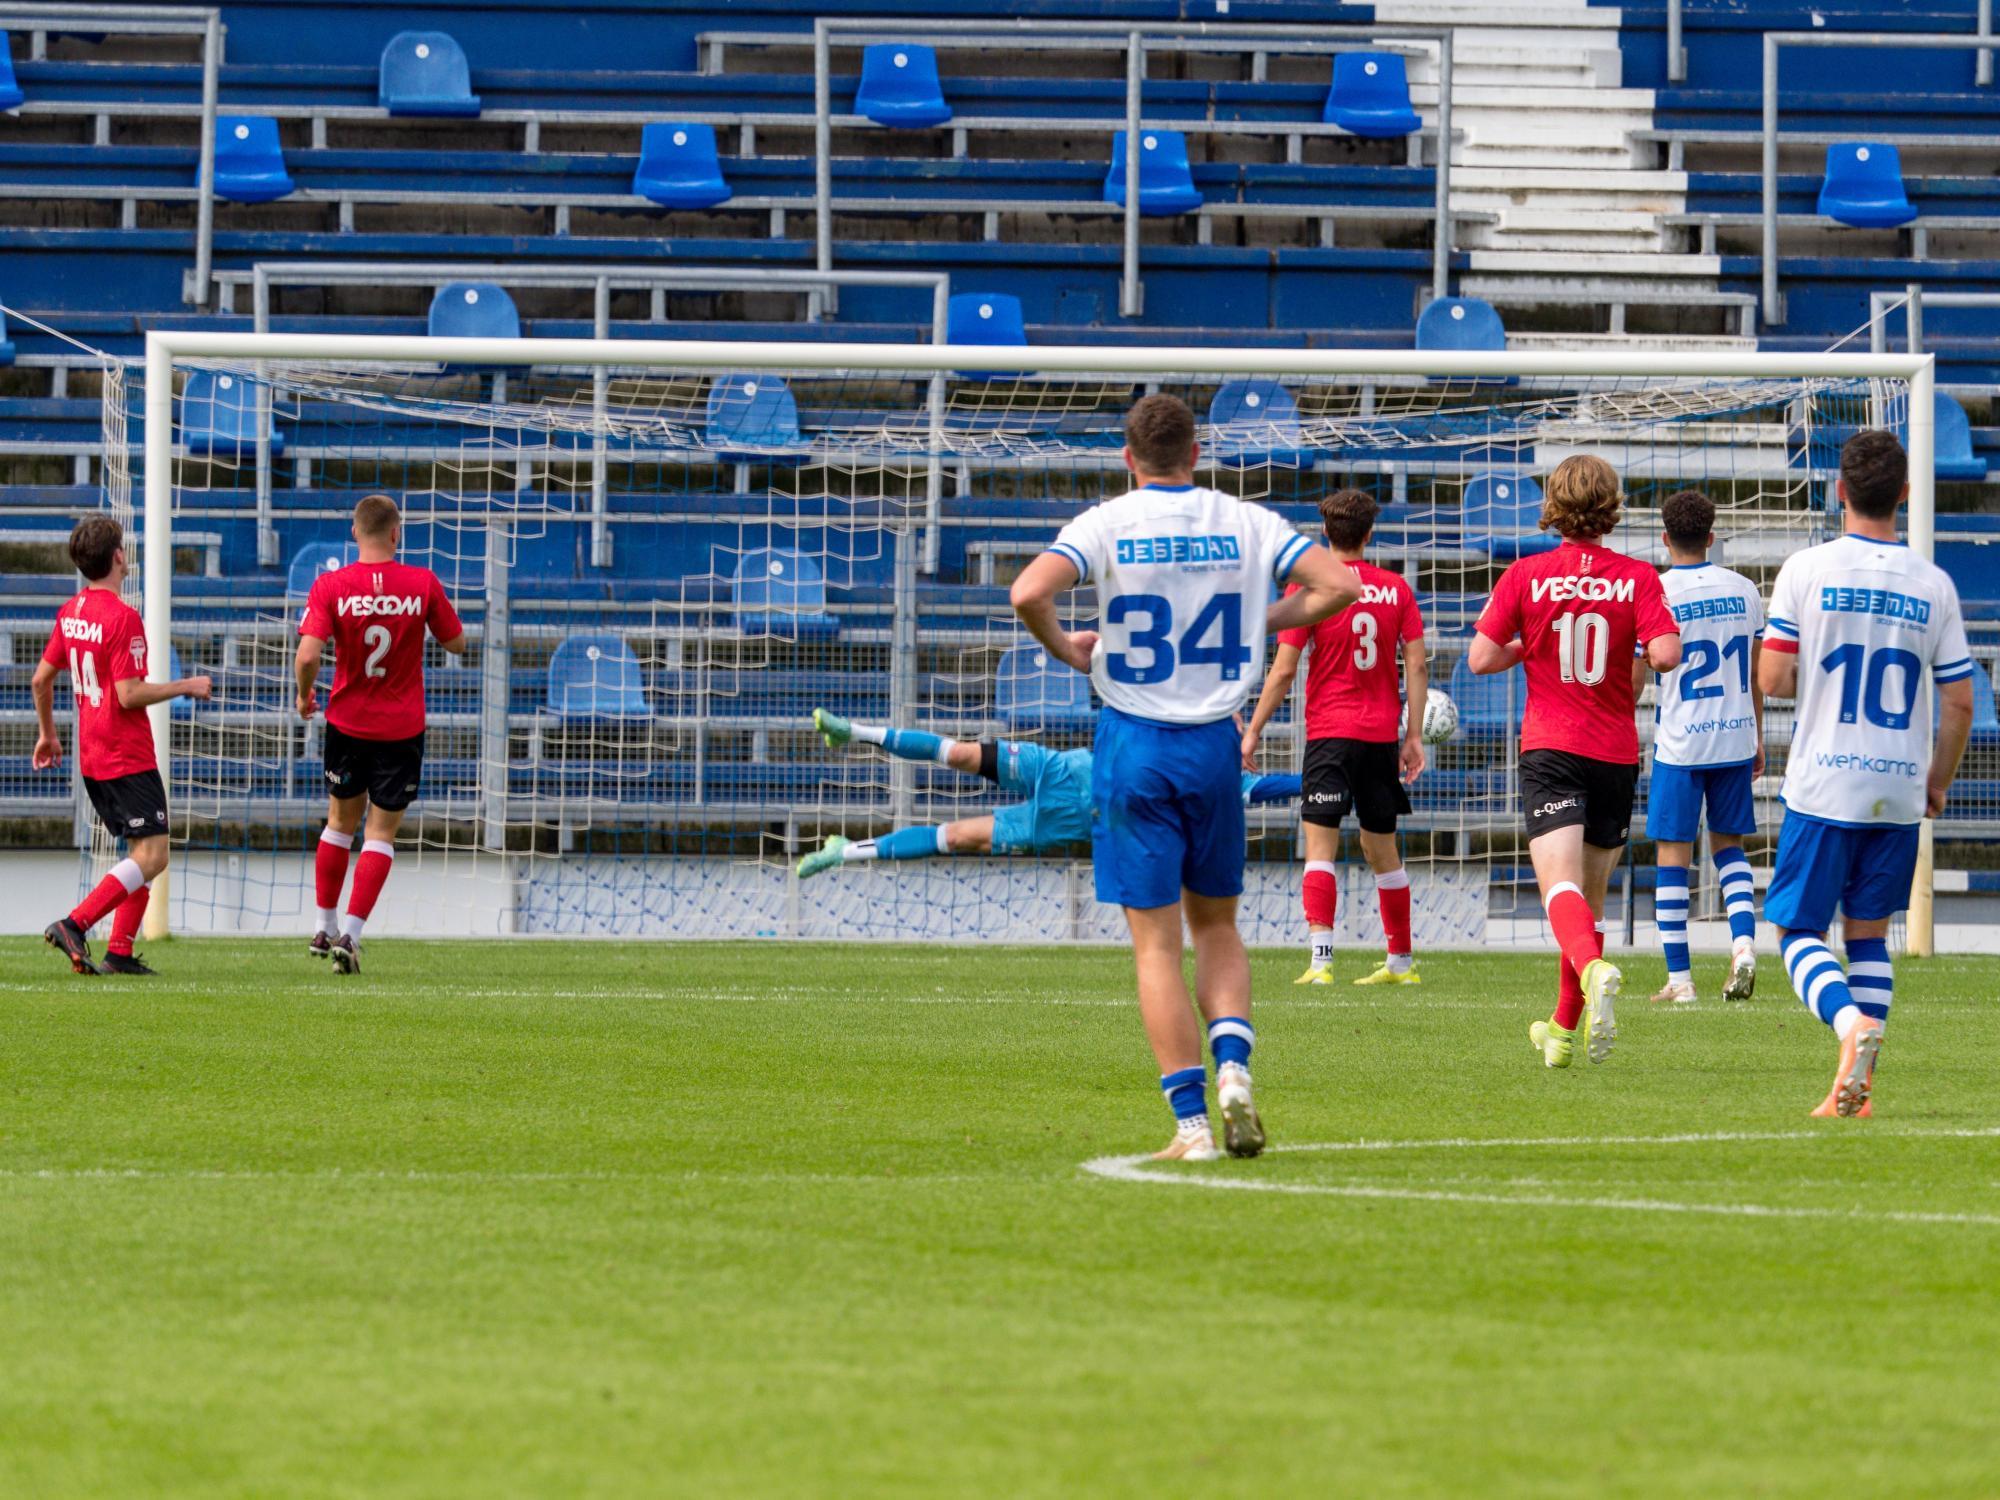 Zwolle_3-0.jpg